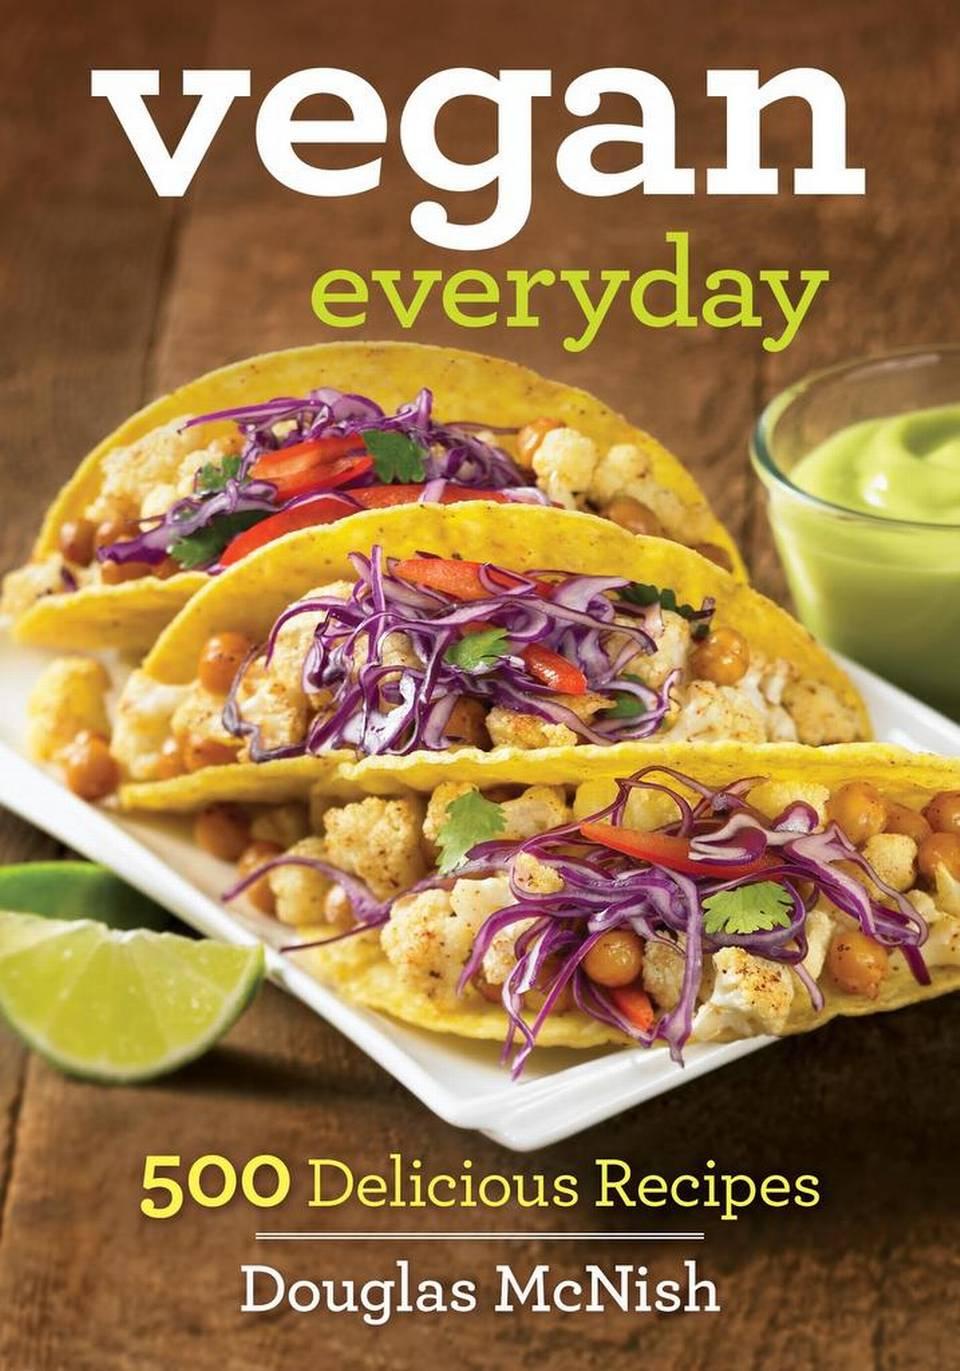 Vegetarian Cookbook Cover : Buddhist noodle bowl vegan everyday giveaway